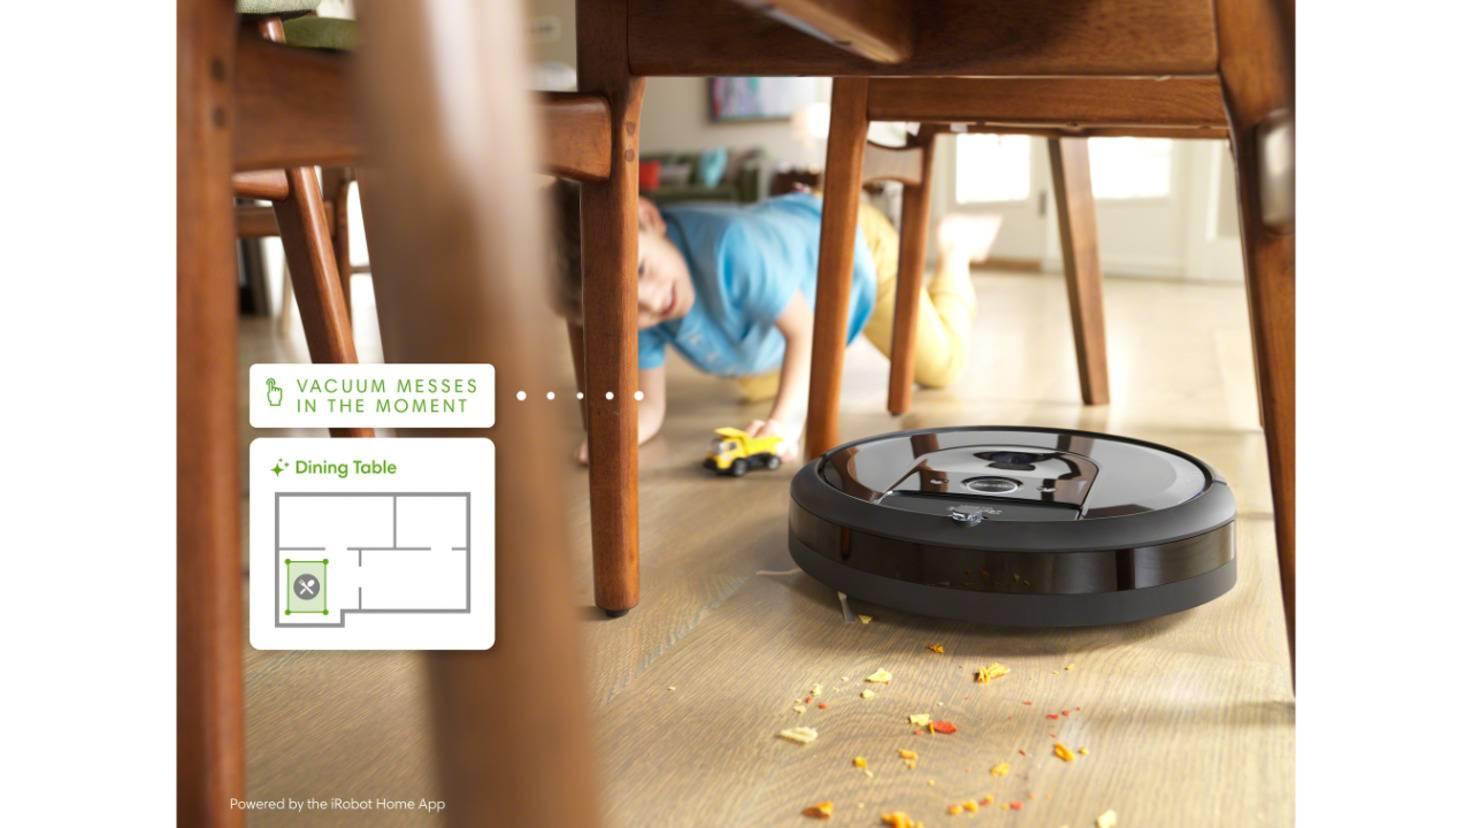 Zone de nettoyage du robot aspirateur iRobot